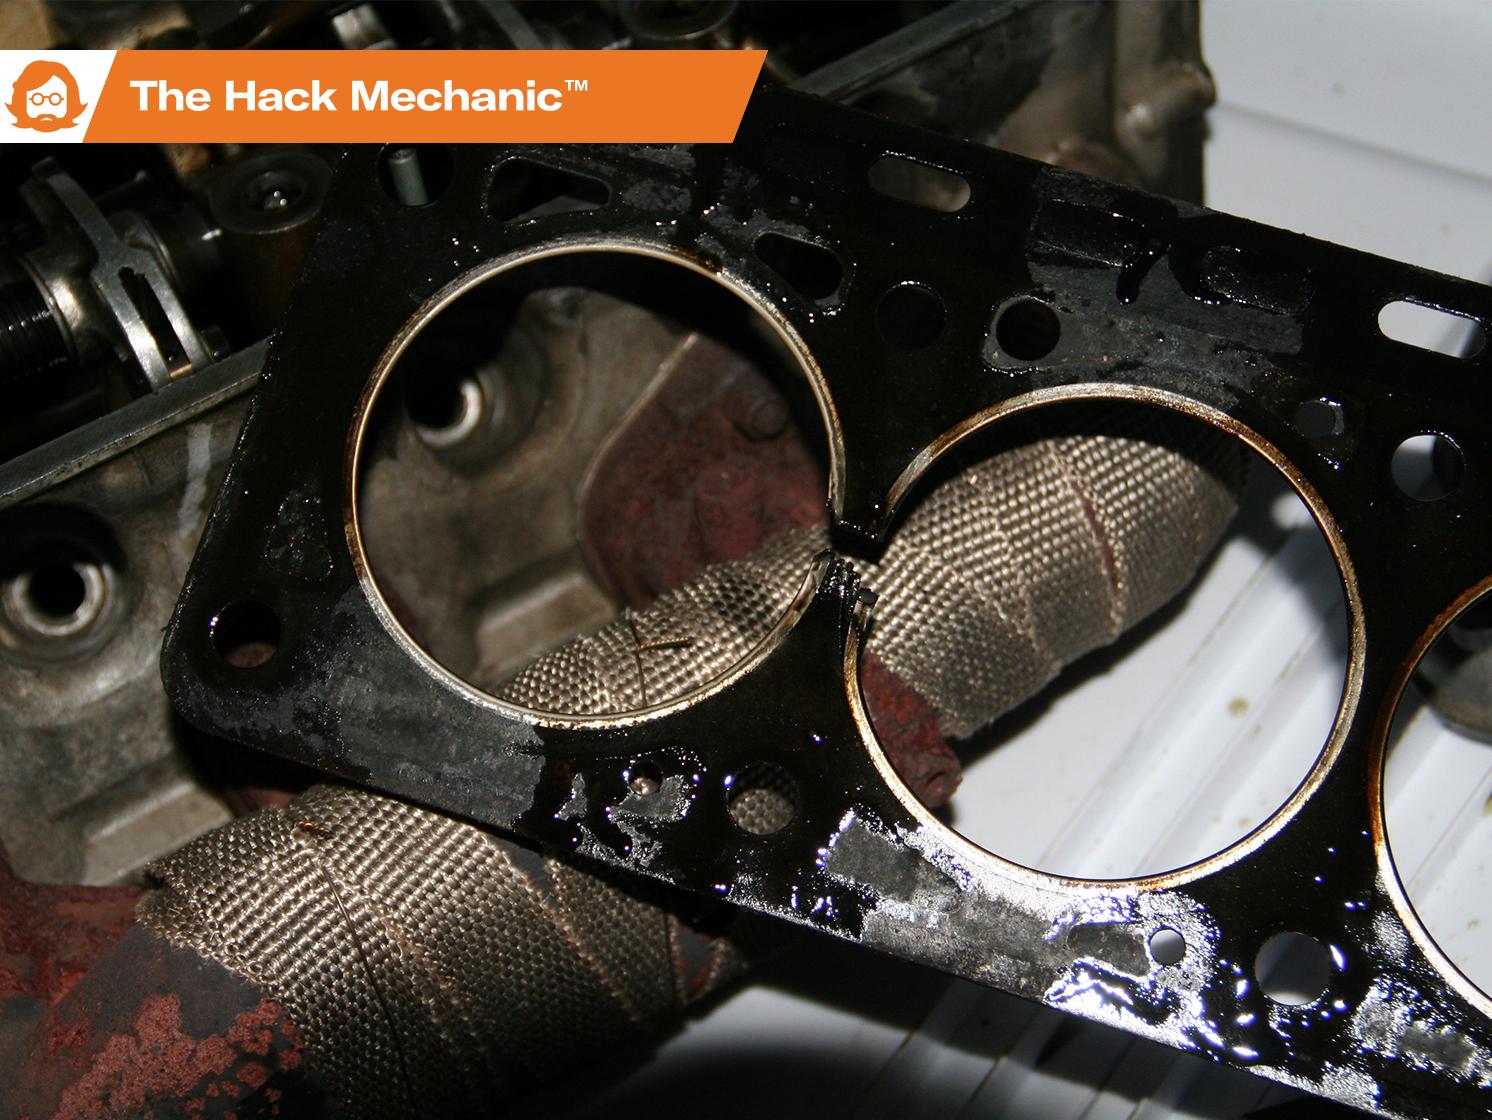 Hack_Mechanic_TM_Blown_Head_Gasket_Lede